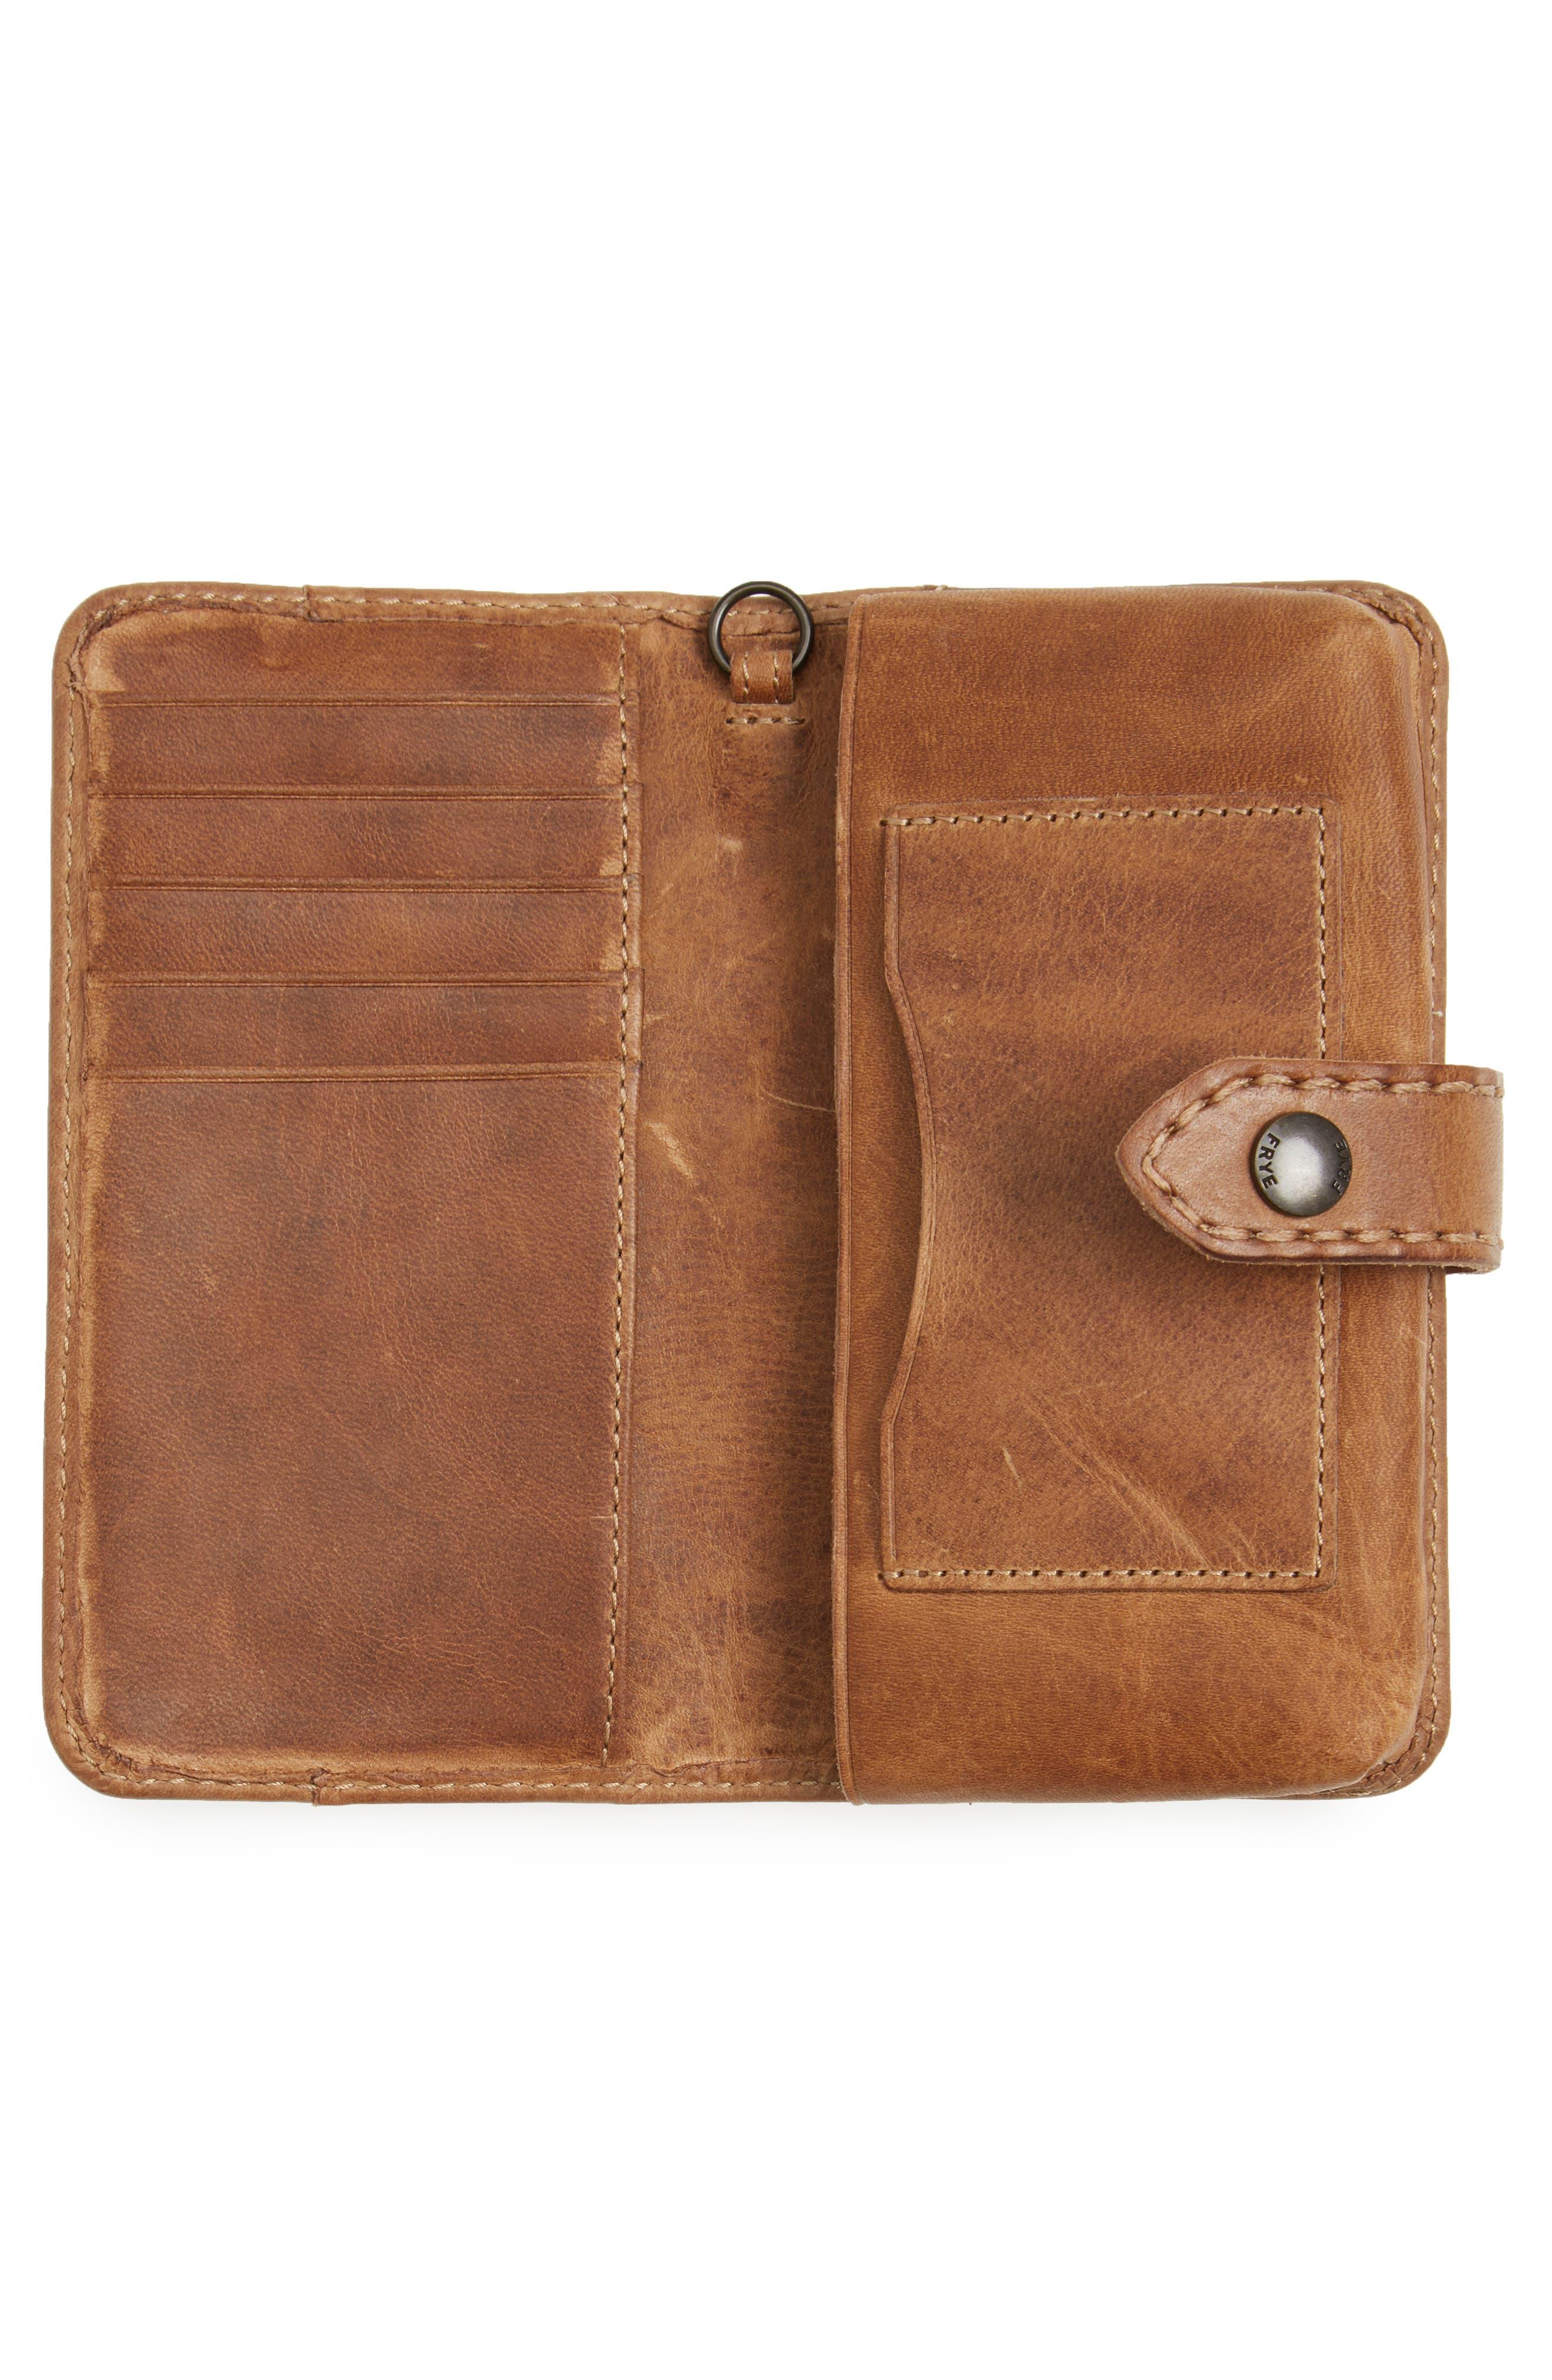 'Melissa' Leather Phone Wallet,                             Alternate thumbnail 2, color,                             Beige